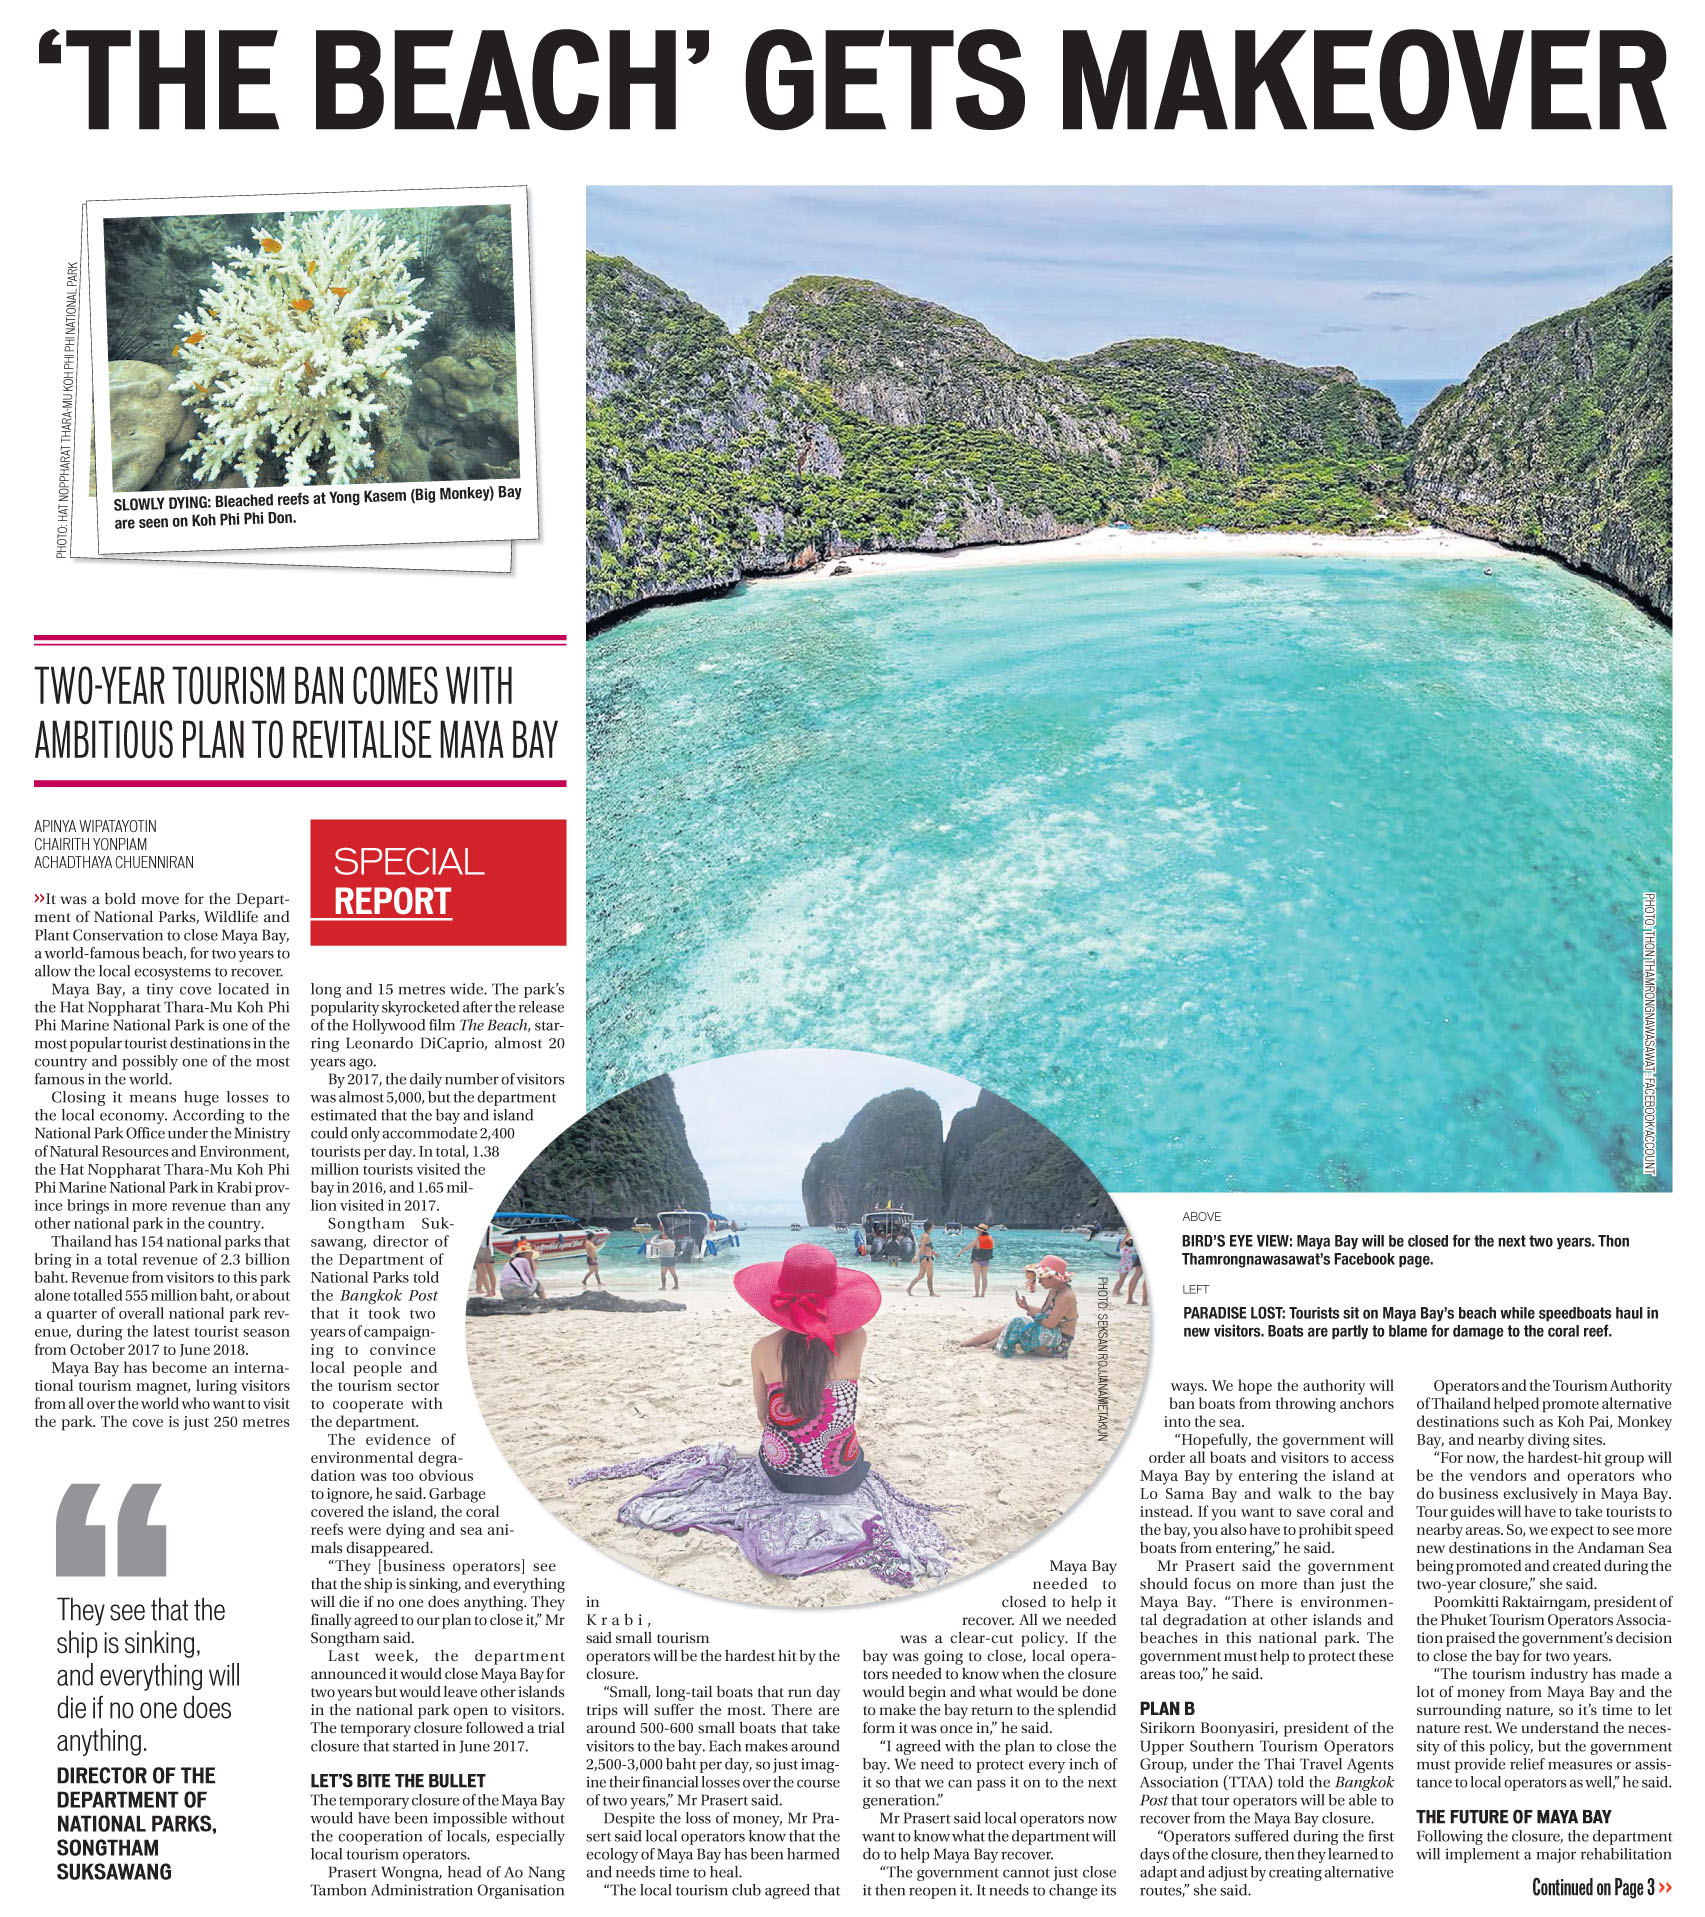 Bangkok Post 2019-05-19 Beach 01.jpg